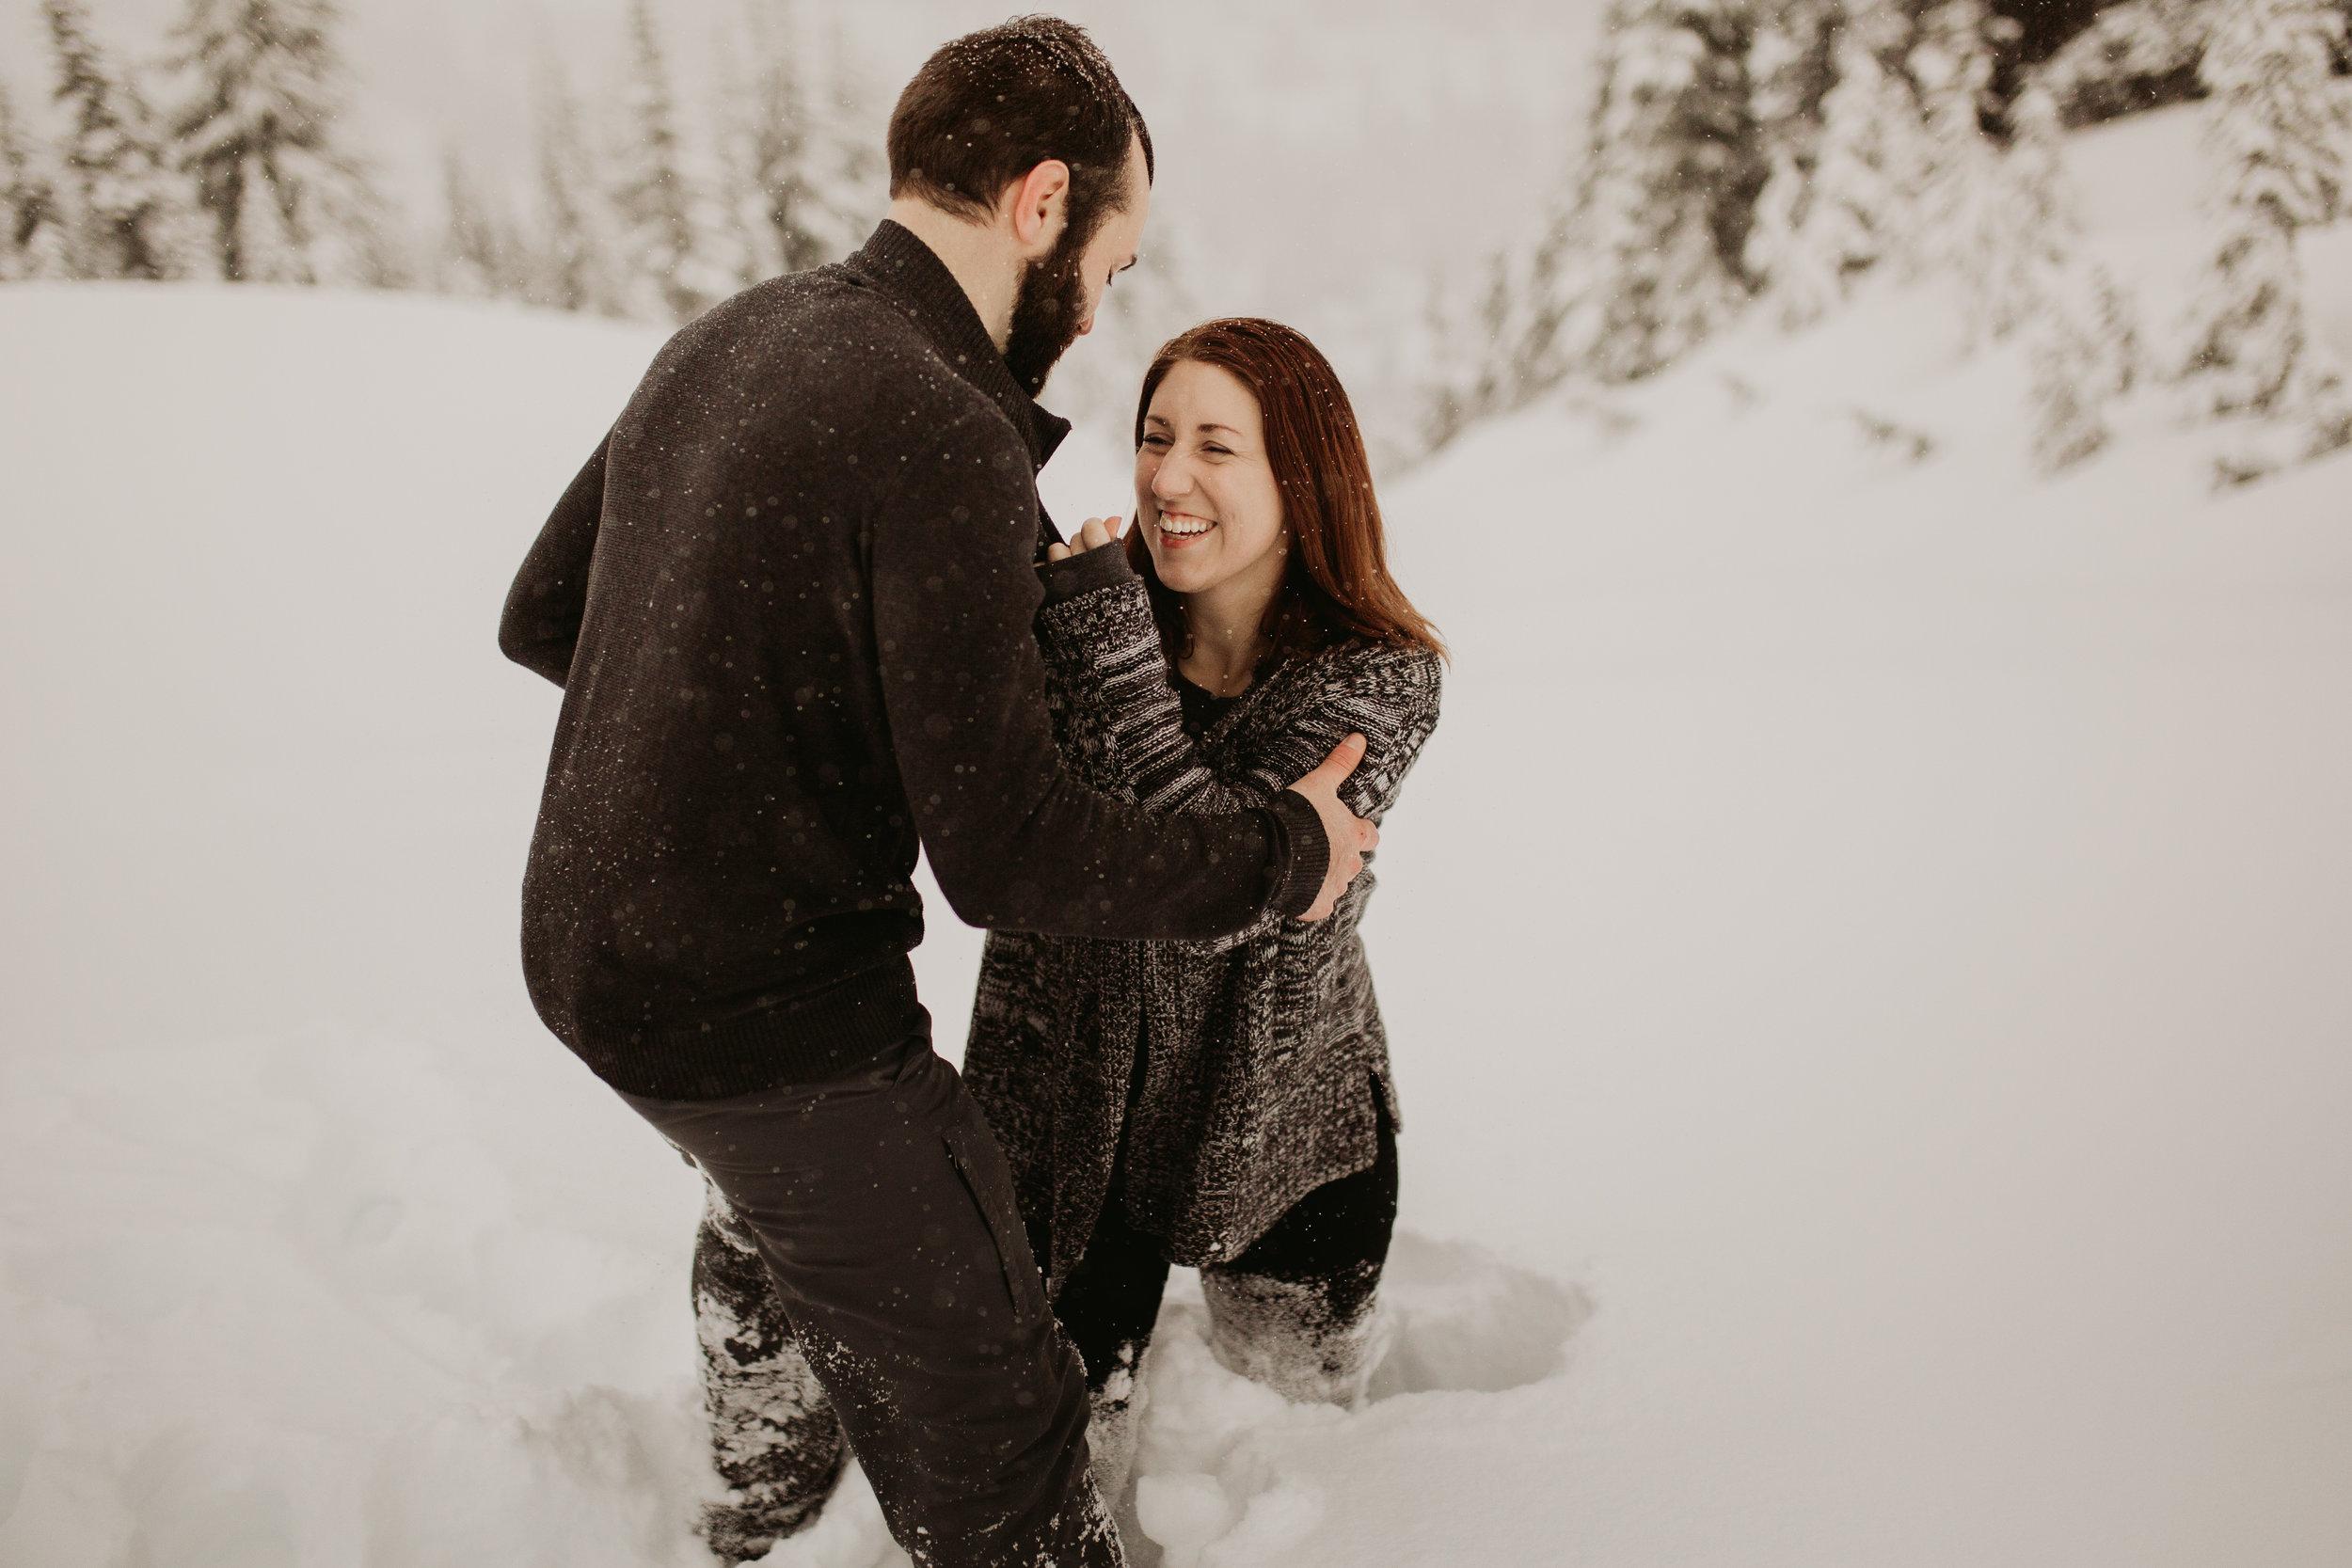 pnw_washington_oregon_elopement_mount_rainer_engagement_wedding_photographer25.jpg